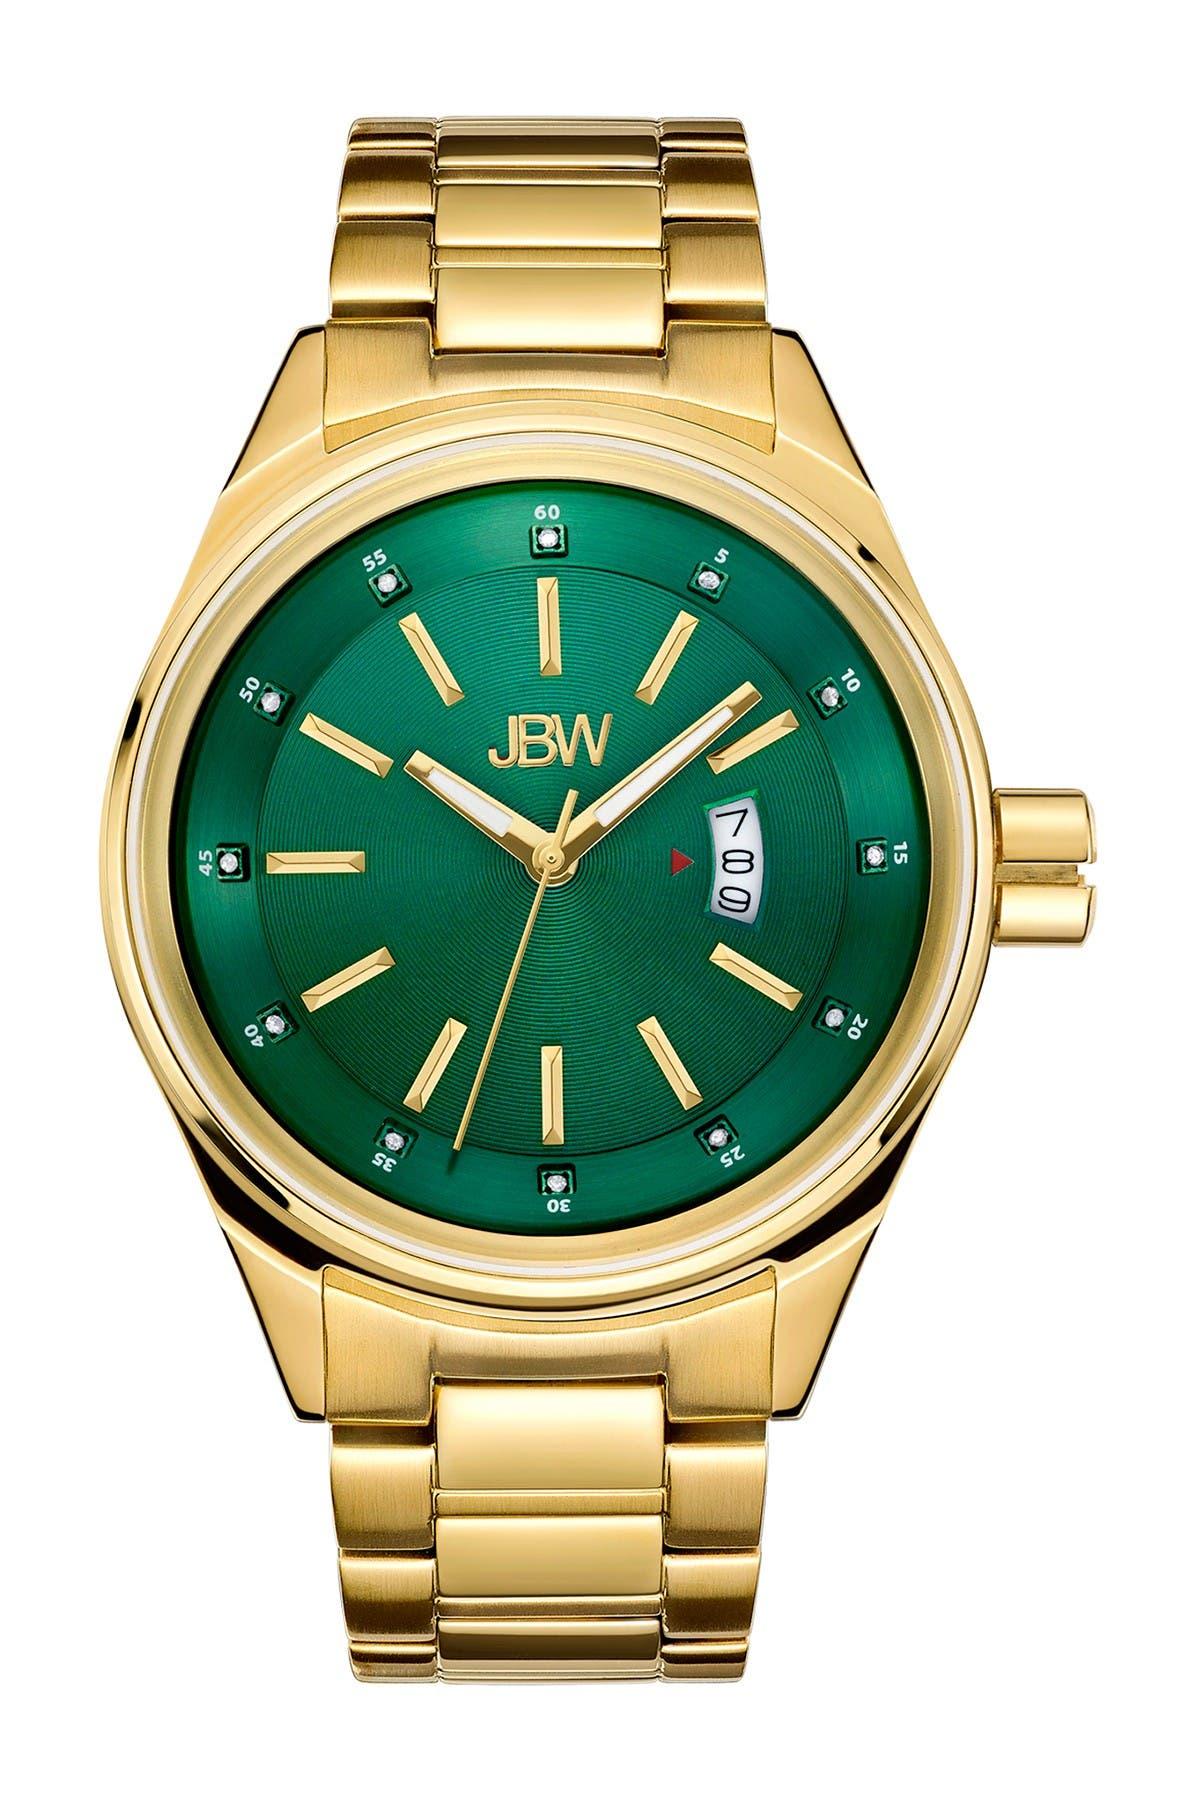 Image of JBW Men's Rook Diamond Watch, 46mm - 0.12 ctw